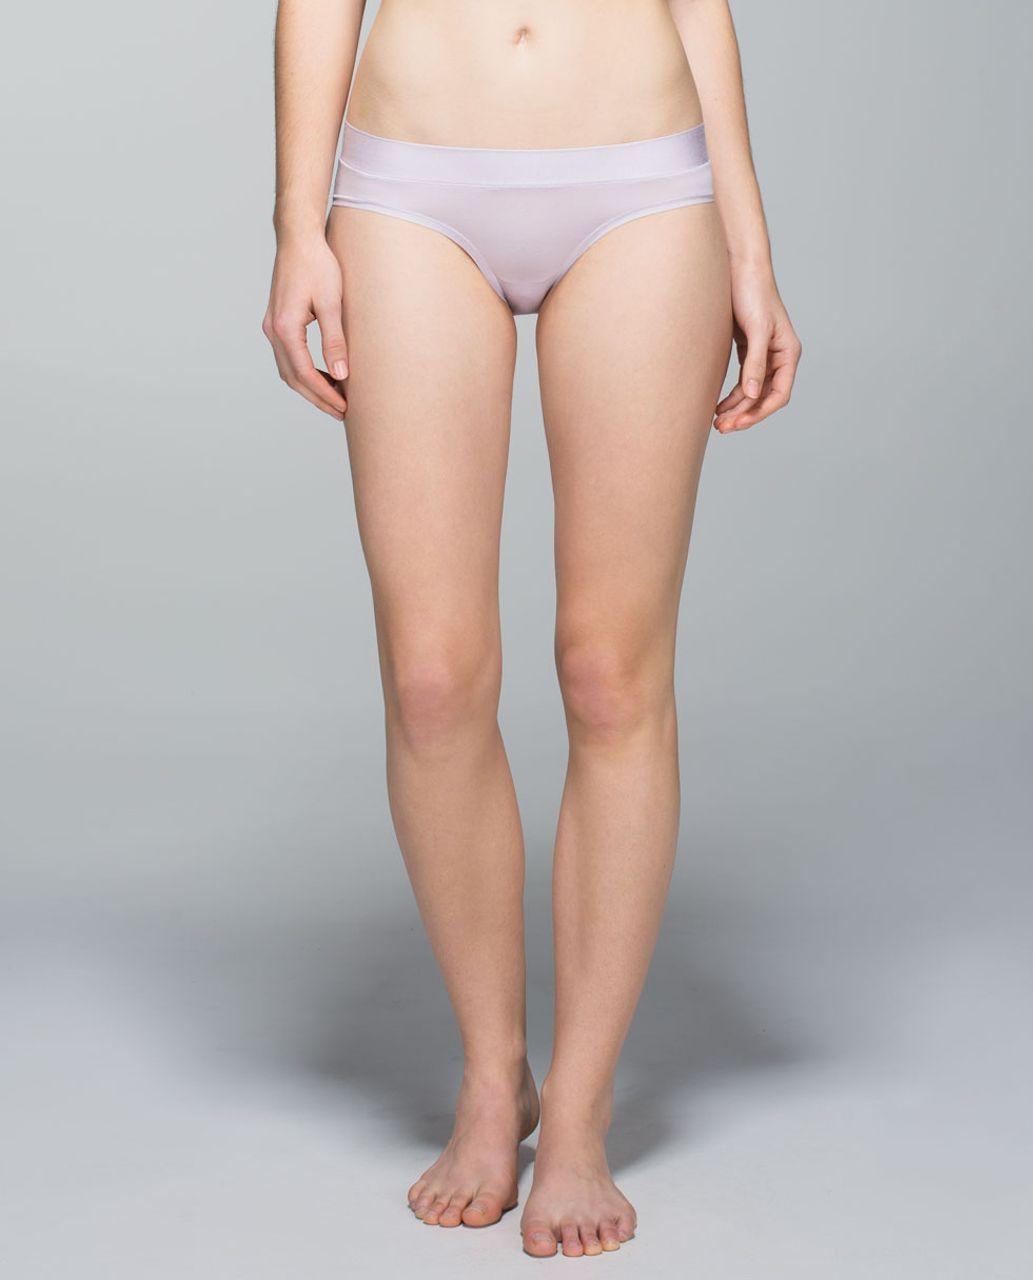 Lululemon Mula Bandhawear Bikini - Storm Mauve